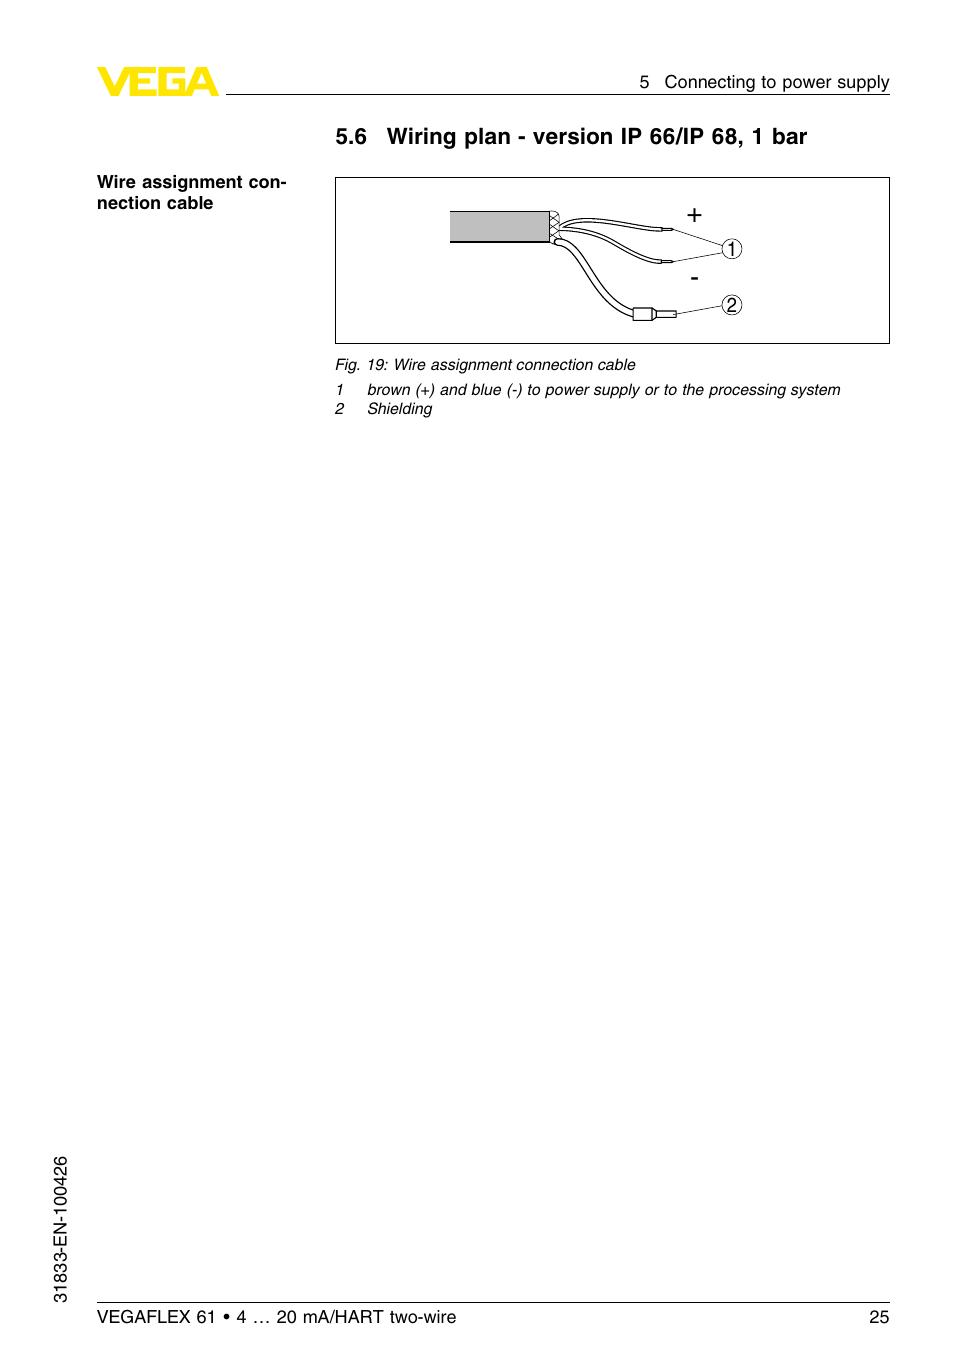 Vega vegaflex 61 4 … 20 ma_hart two-wire user manual | page 52 / 64.